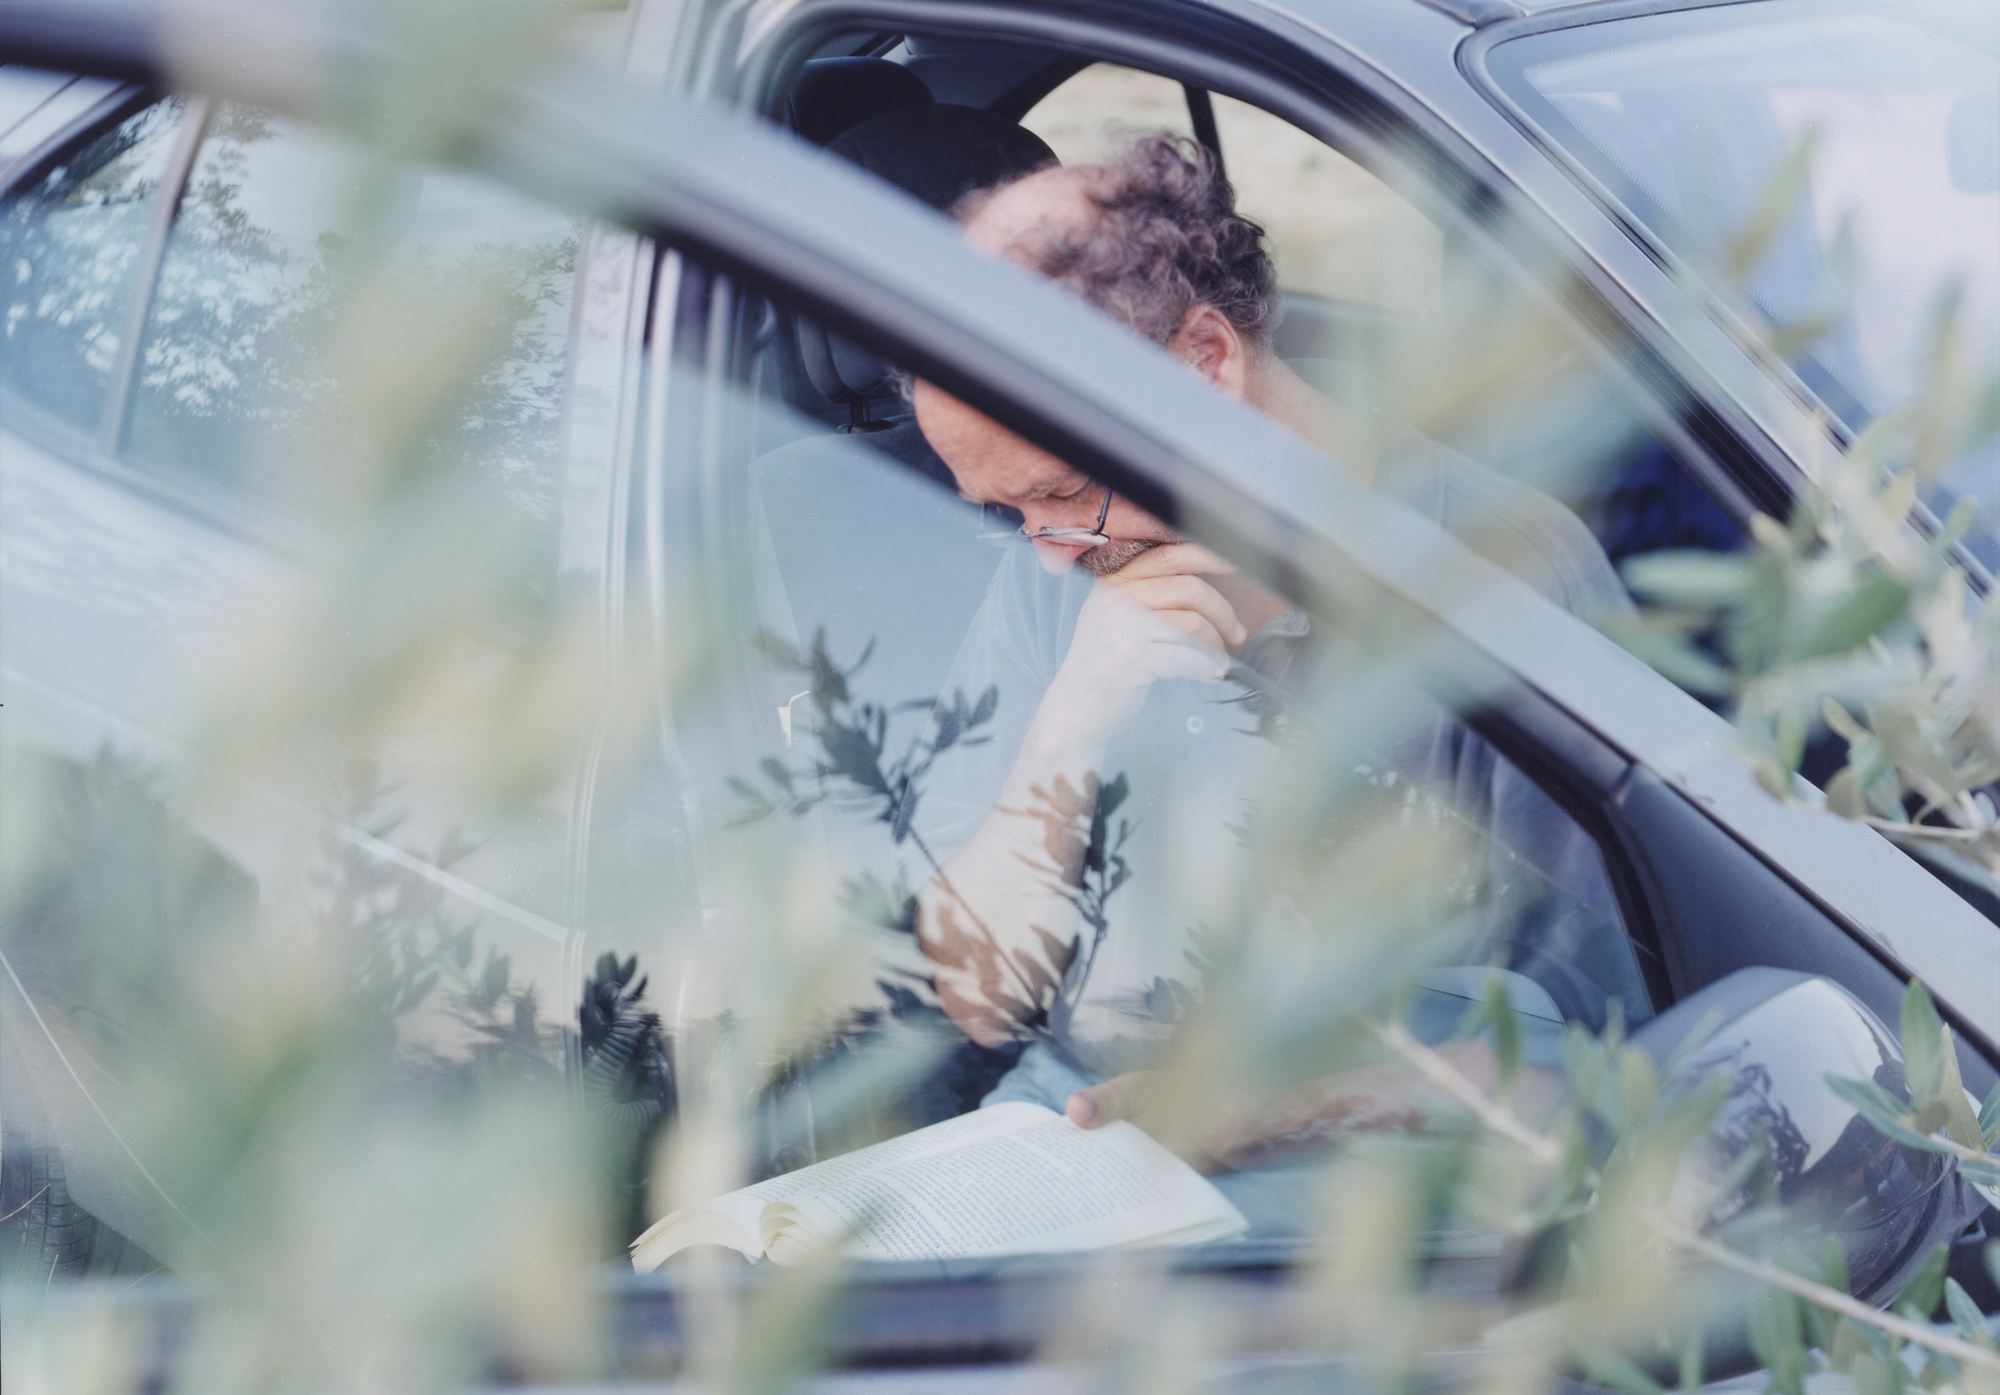 READING IN THE OLIVE TREES © 2012, JoAnn Verburg